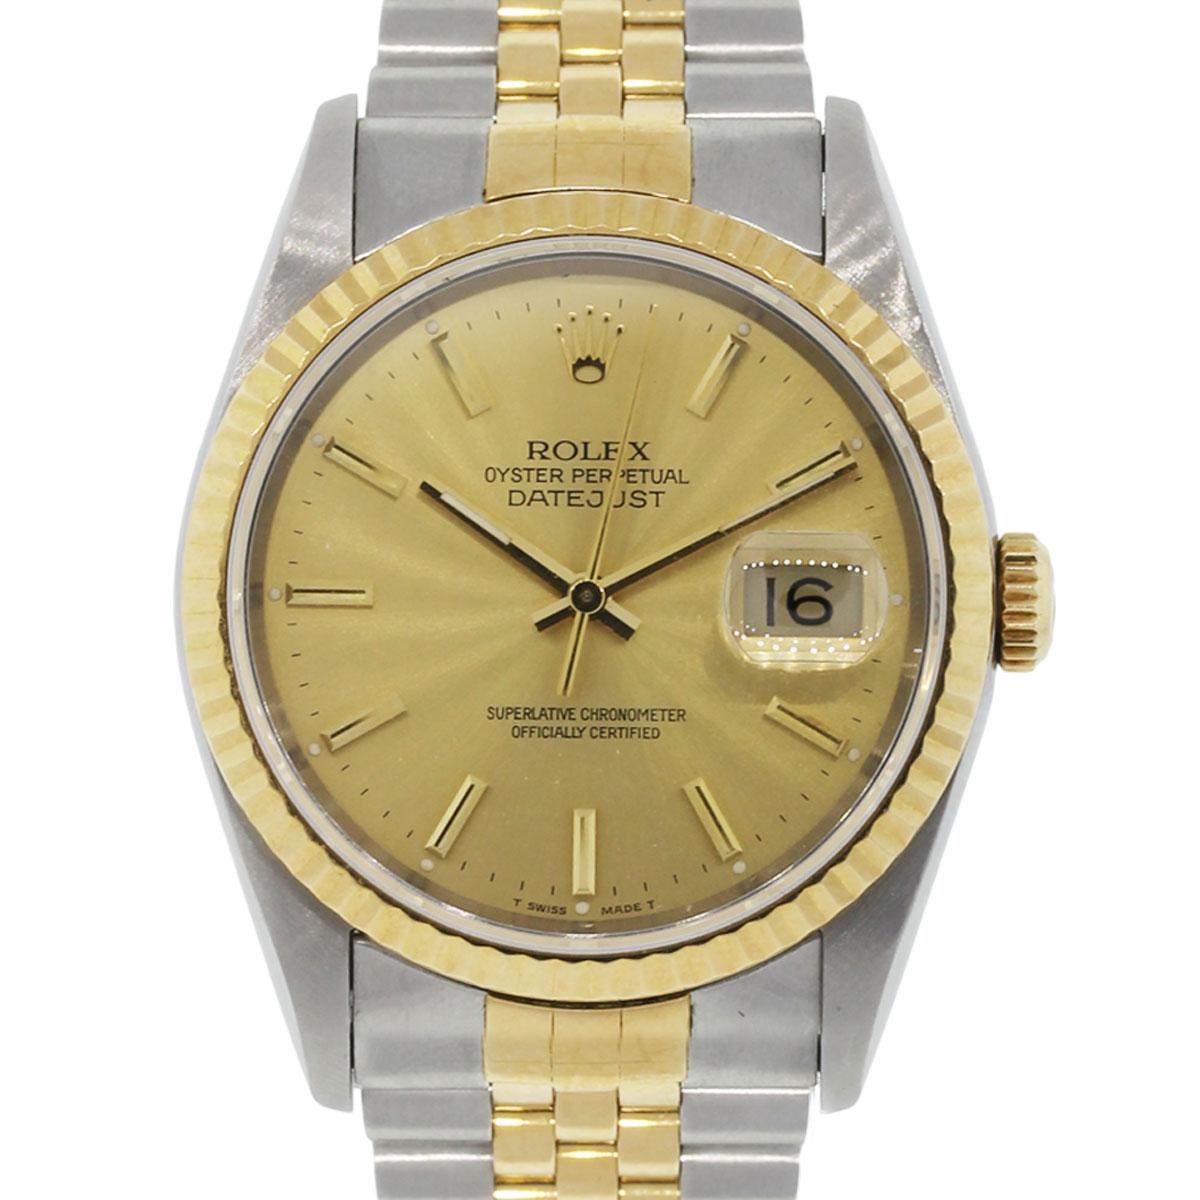 Rolex Datejust 16233 TT Champagne Dial Mens Watch